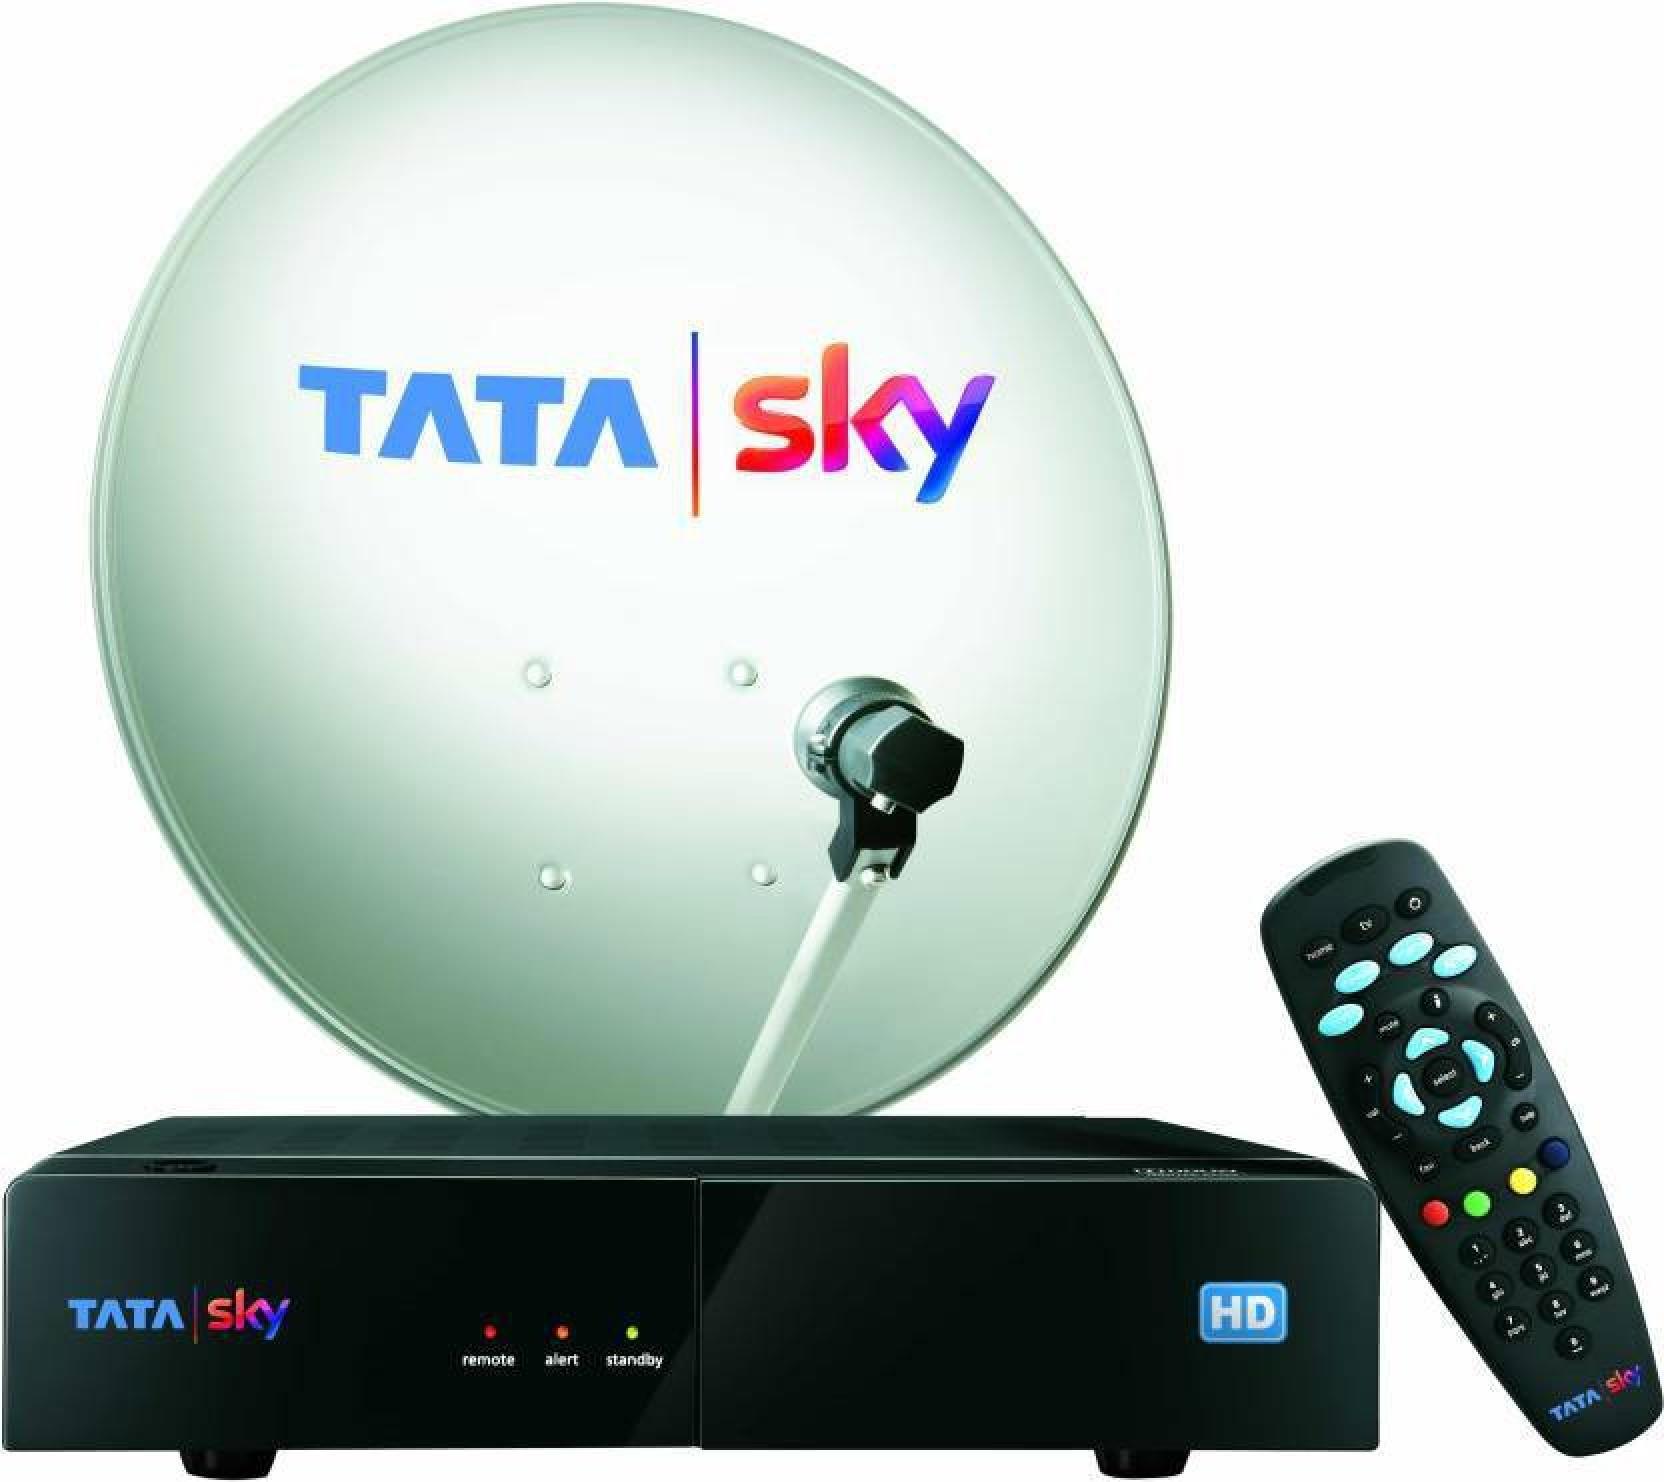 Tata Sky Hd Set Top Box Price In India Buy Wiring Add To Cart